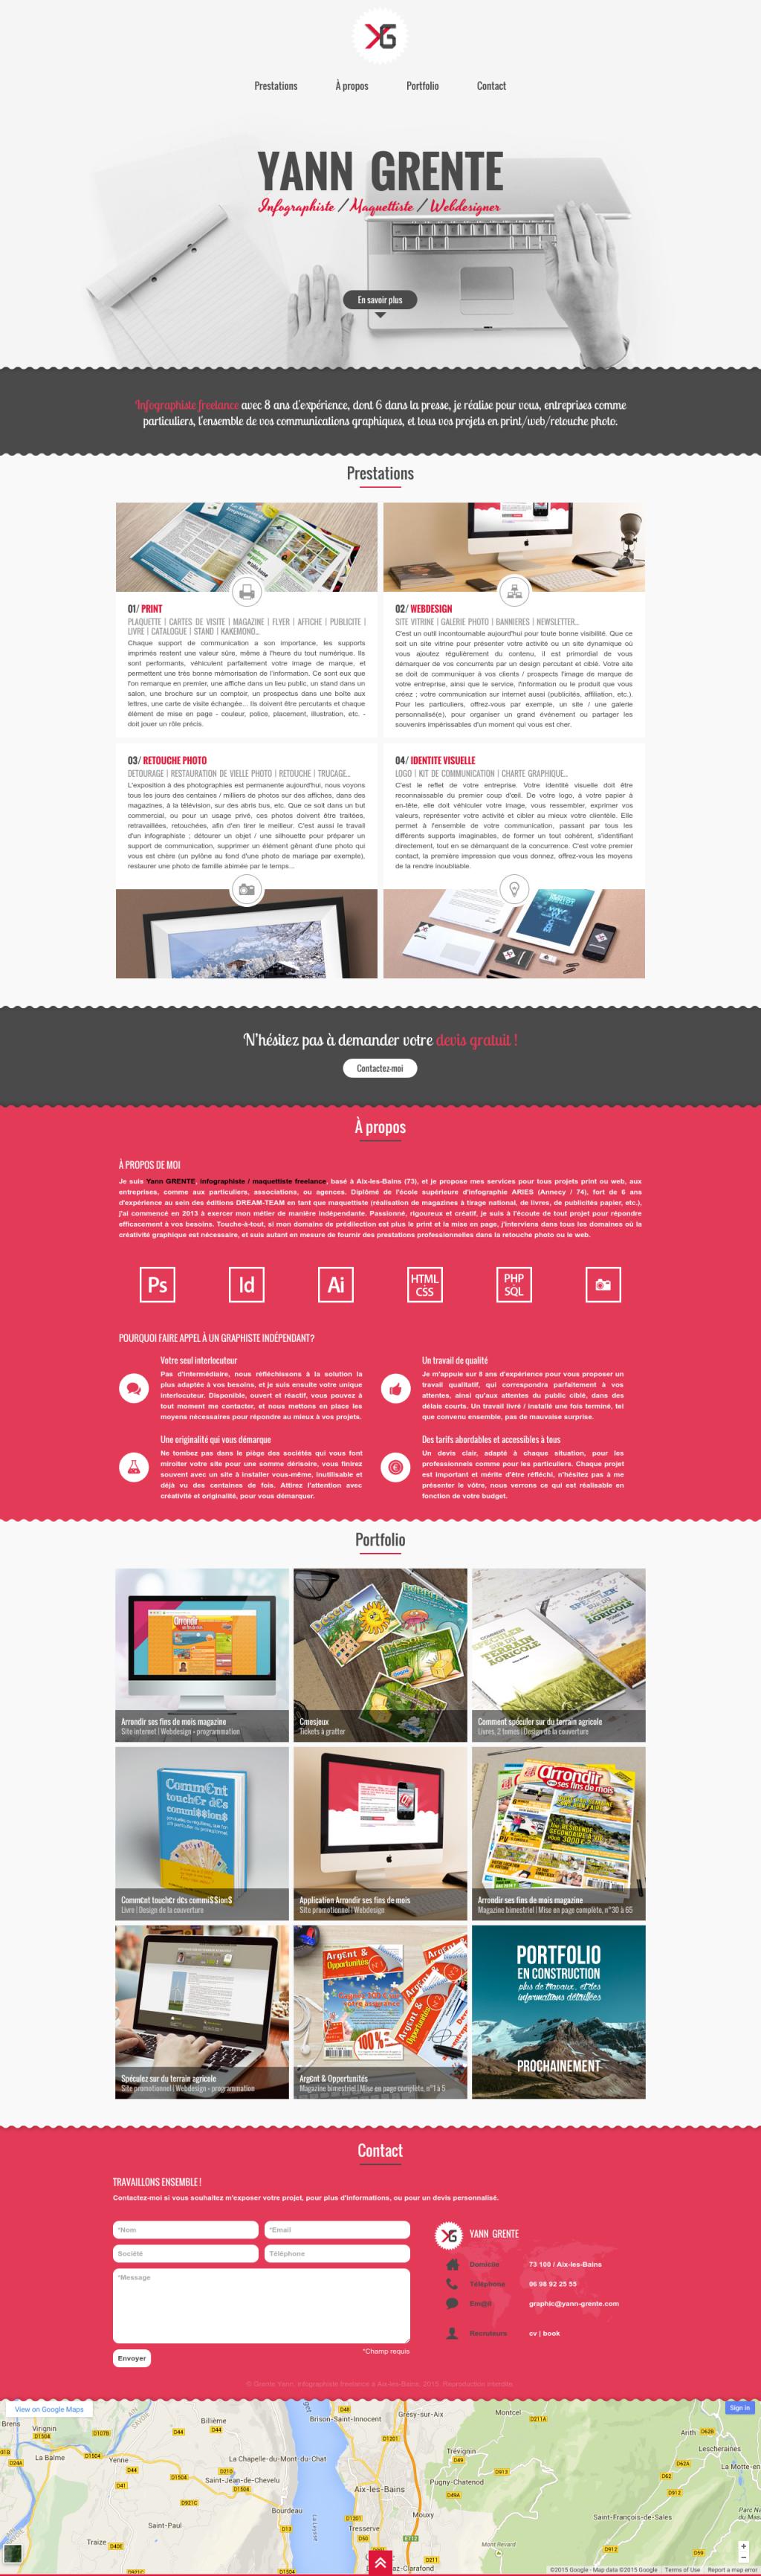 yann grente - cv   maquettiste    webdesigner